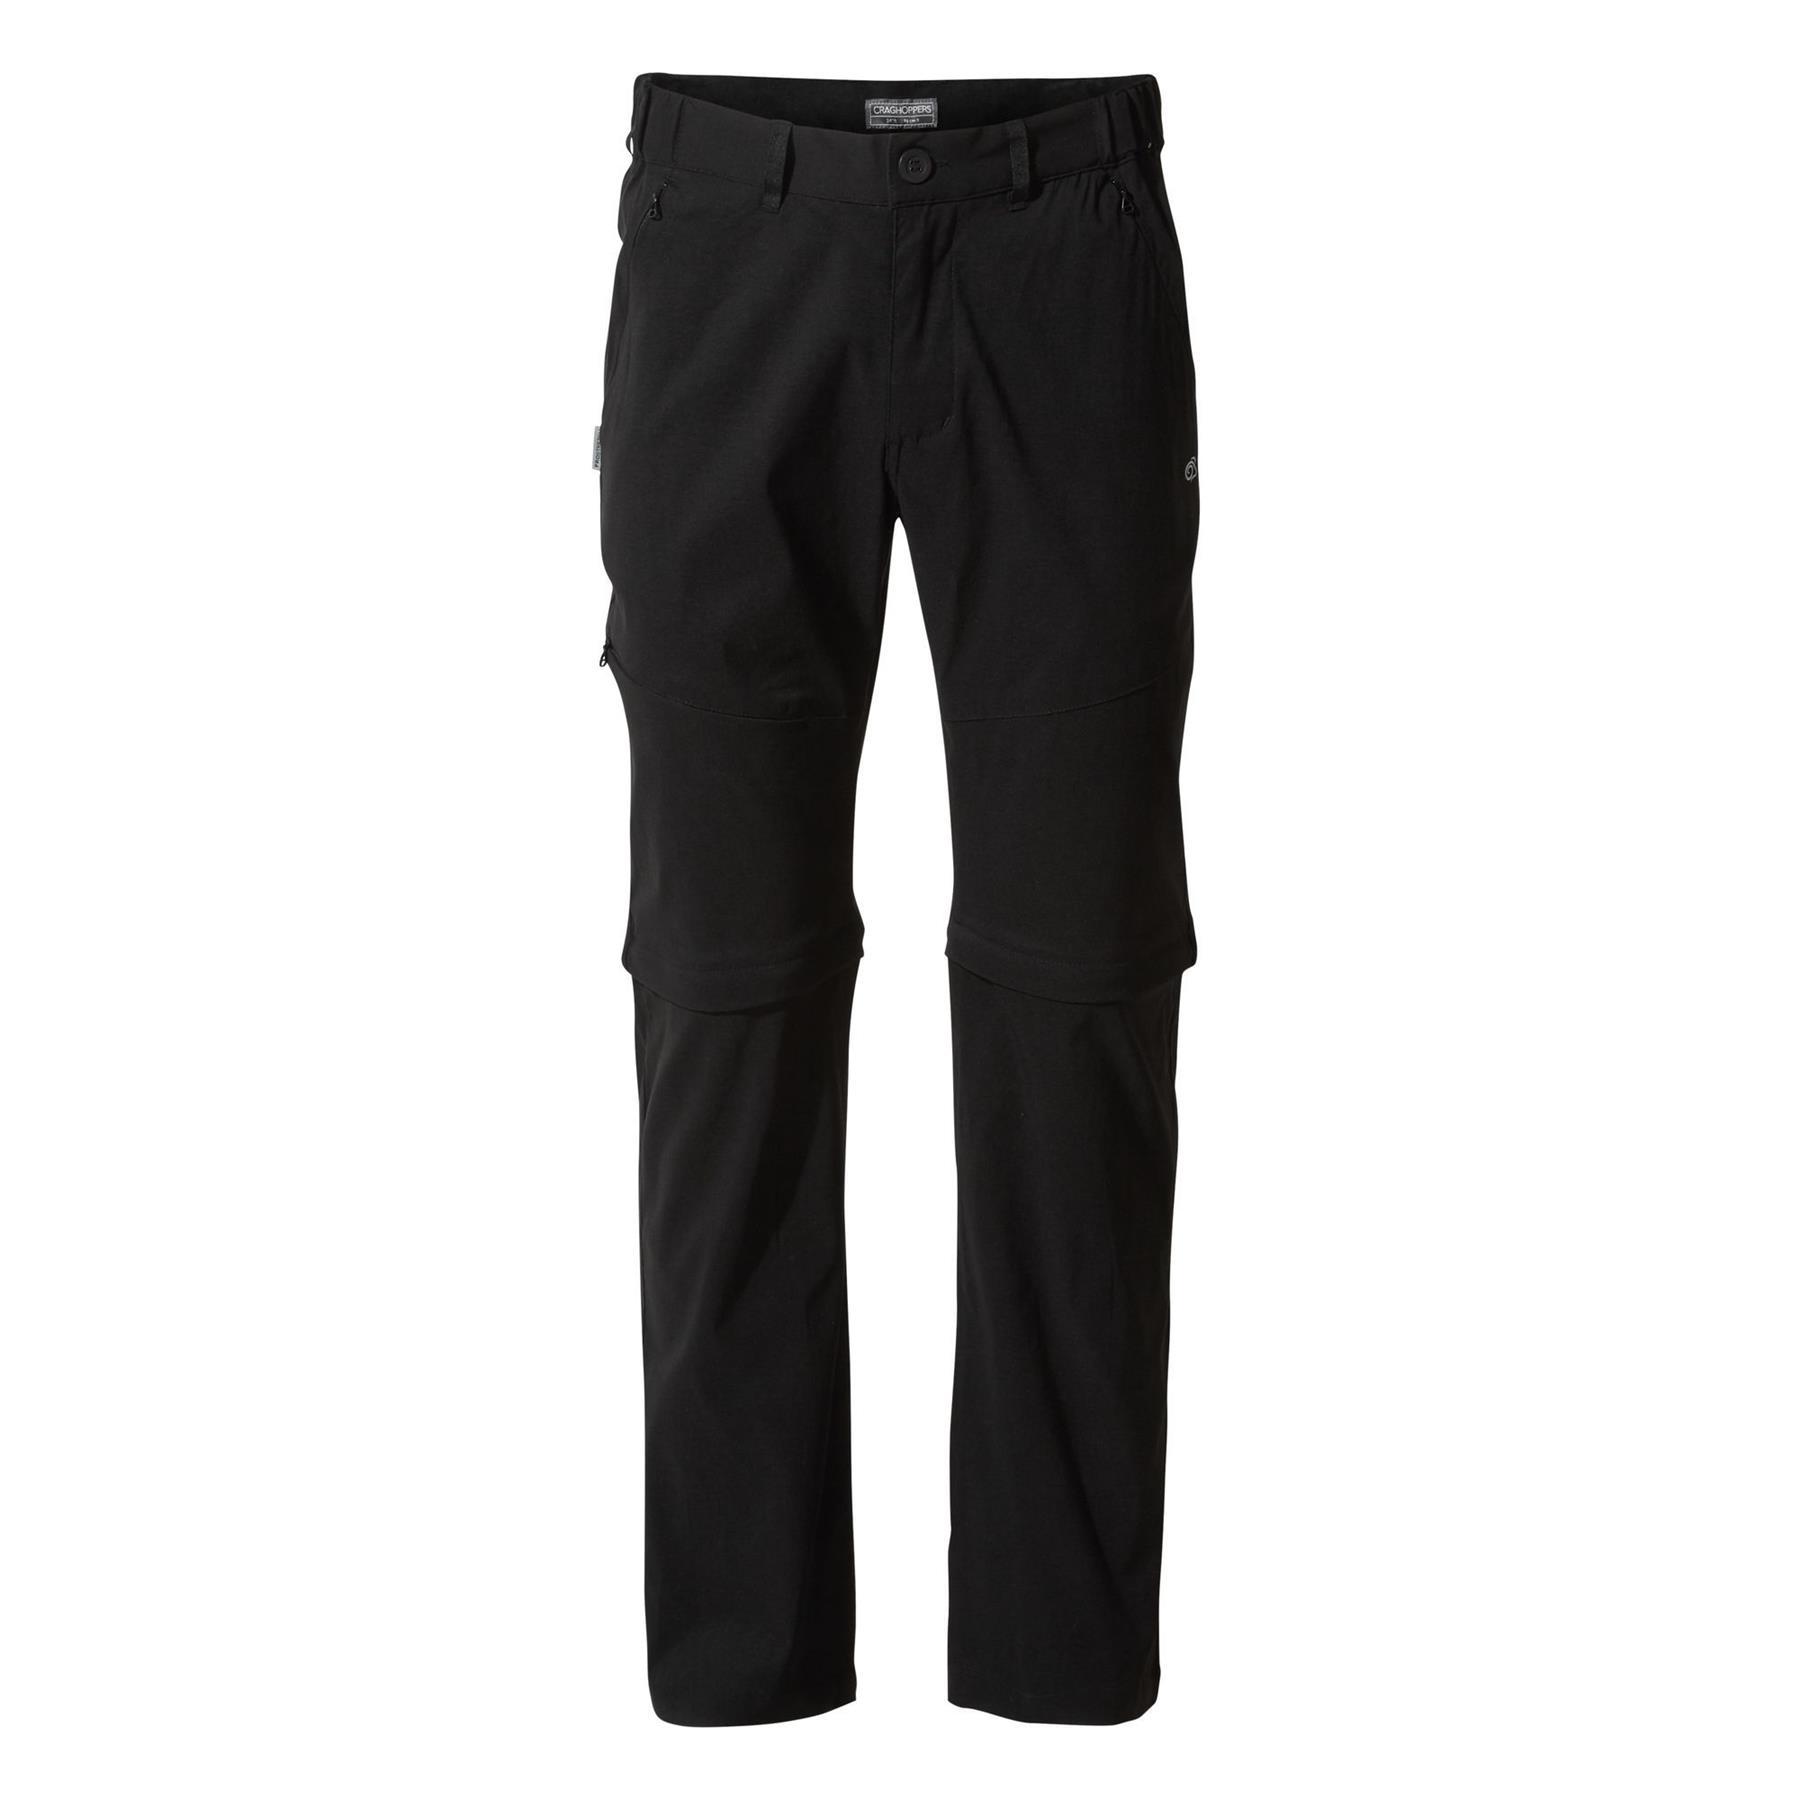 Craghoppers Mens KIWI PRO II CONVERTIBLE Stretch Zip Off Trousers Work Walking